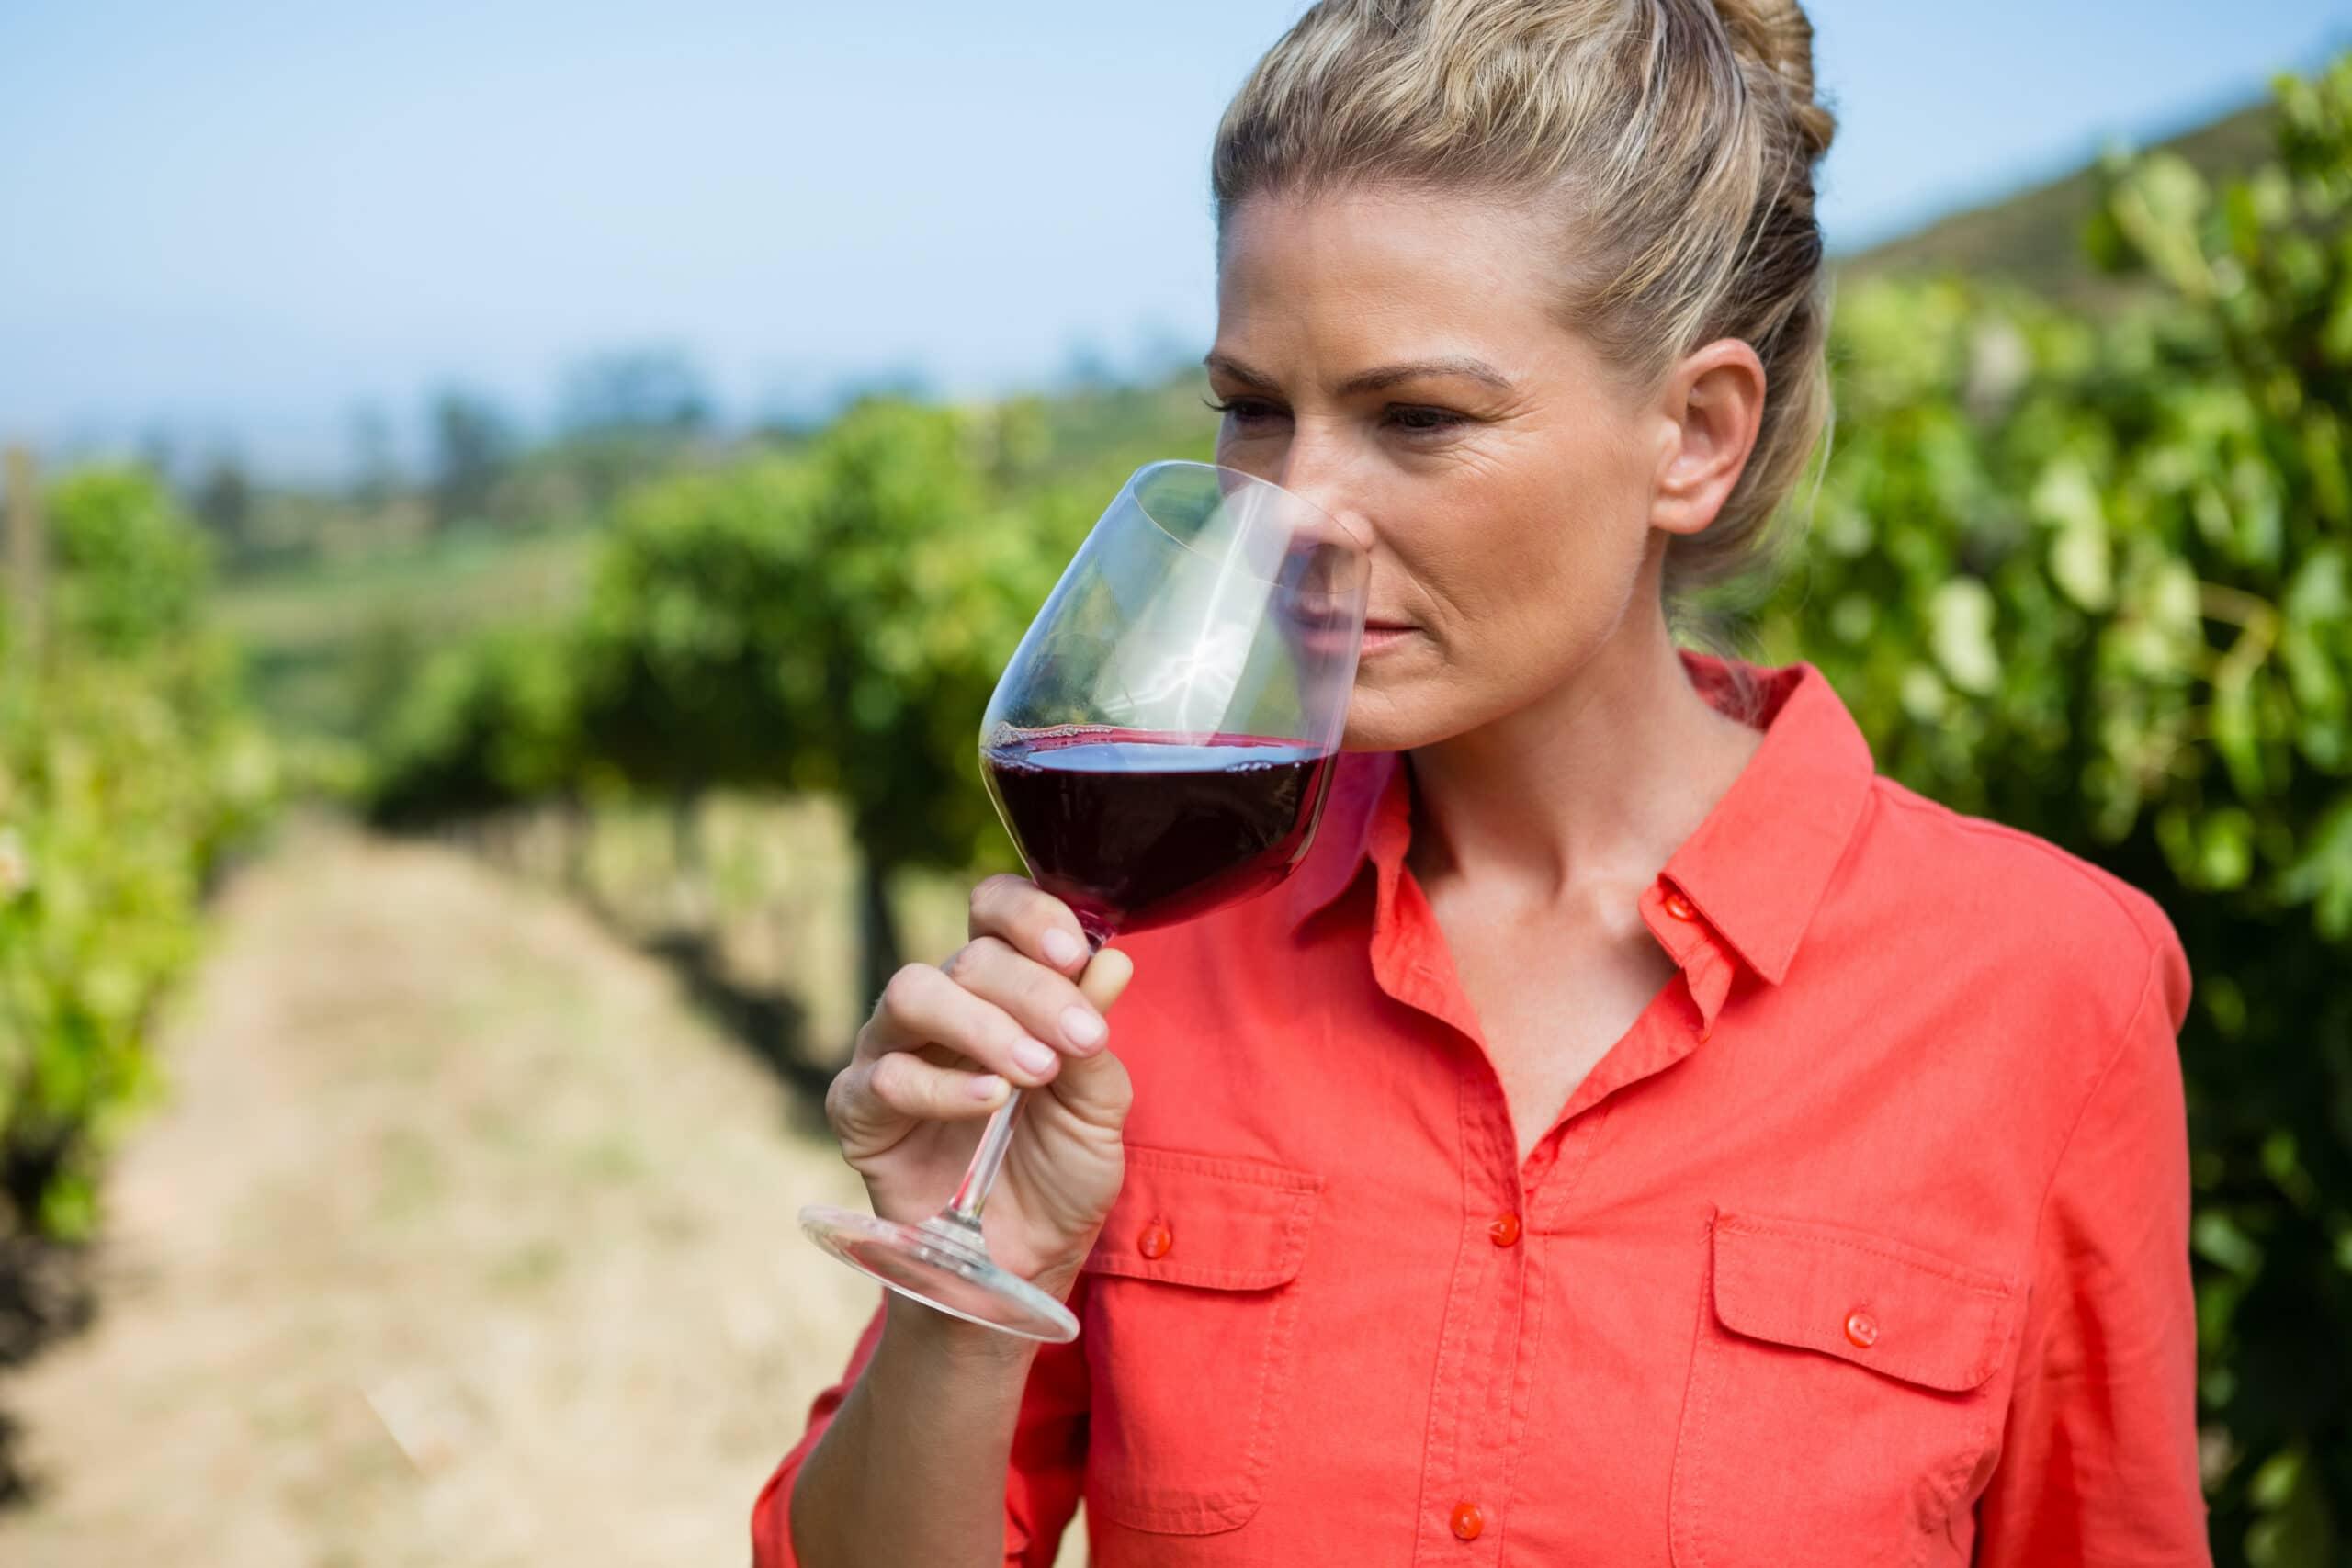 Female vintner smelling glass of wine in vineyard